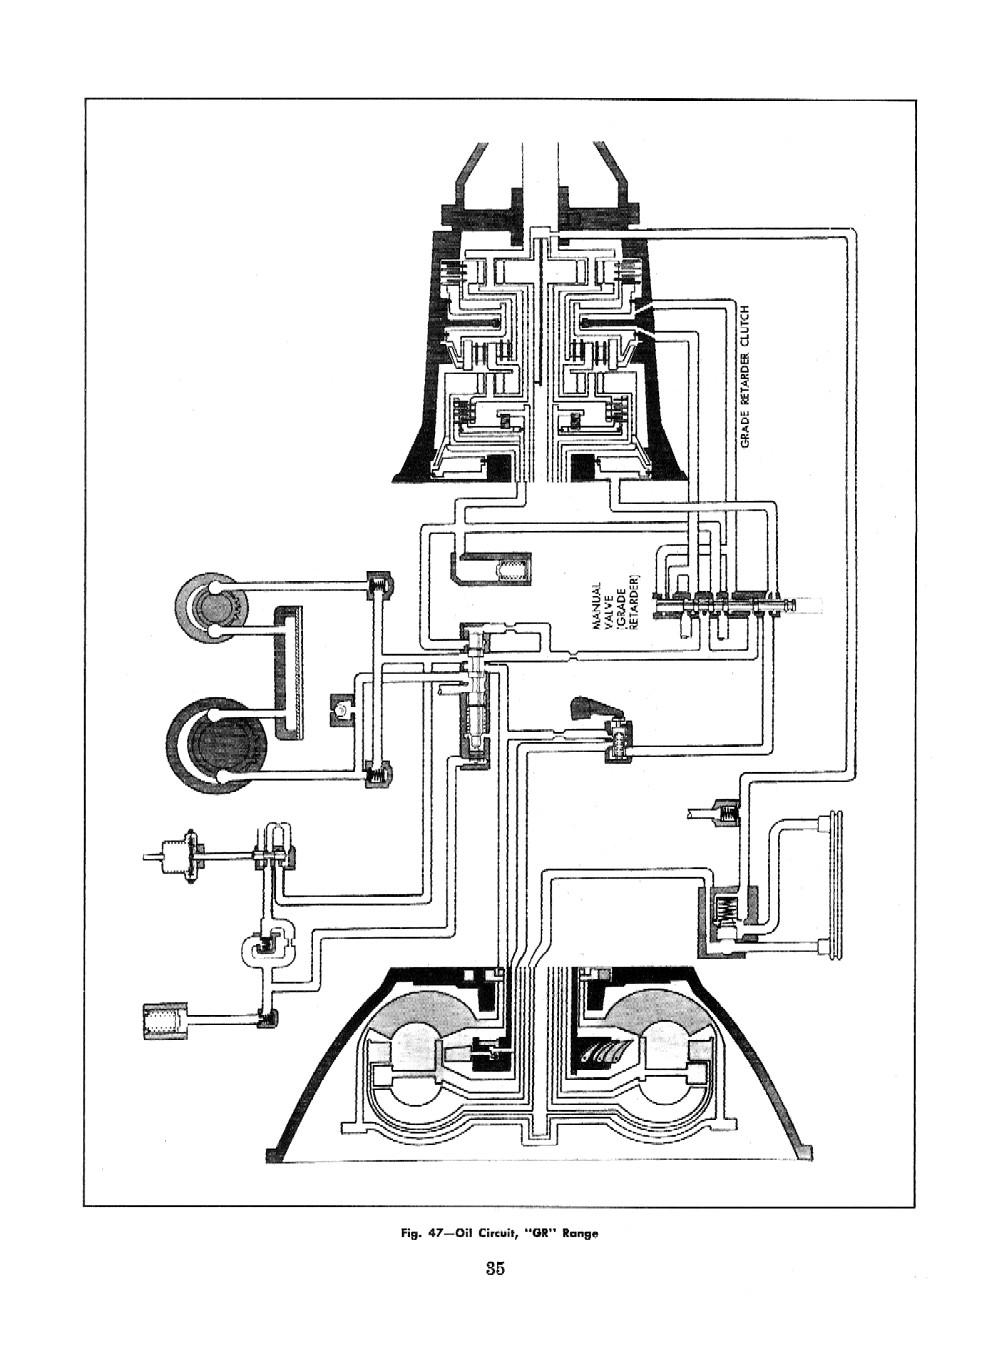 Chevrolet Servicing the 1958 Turboglide Transmission